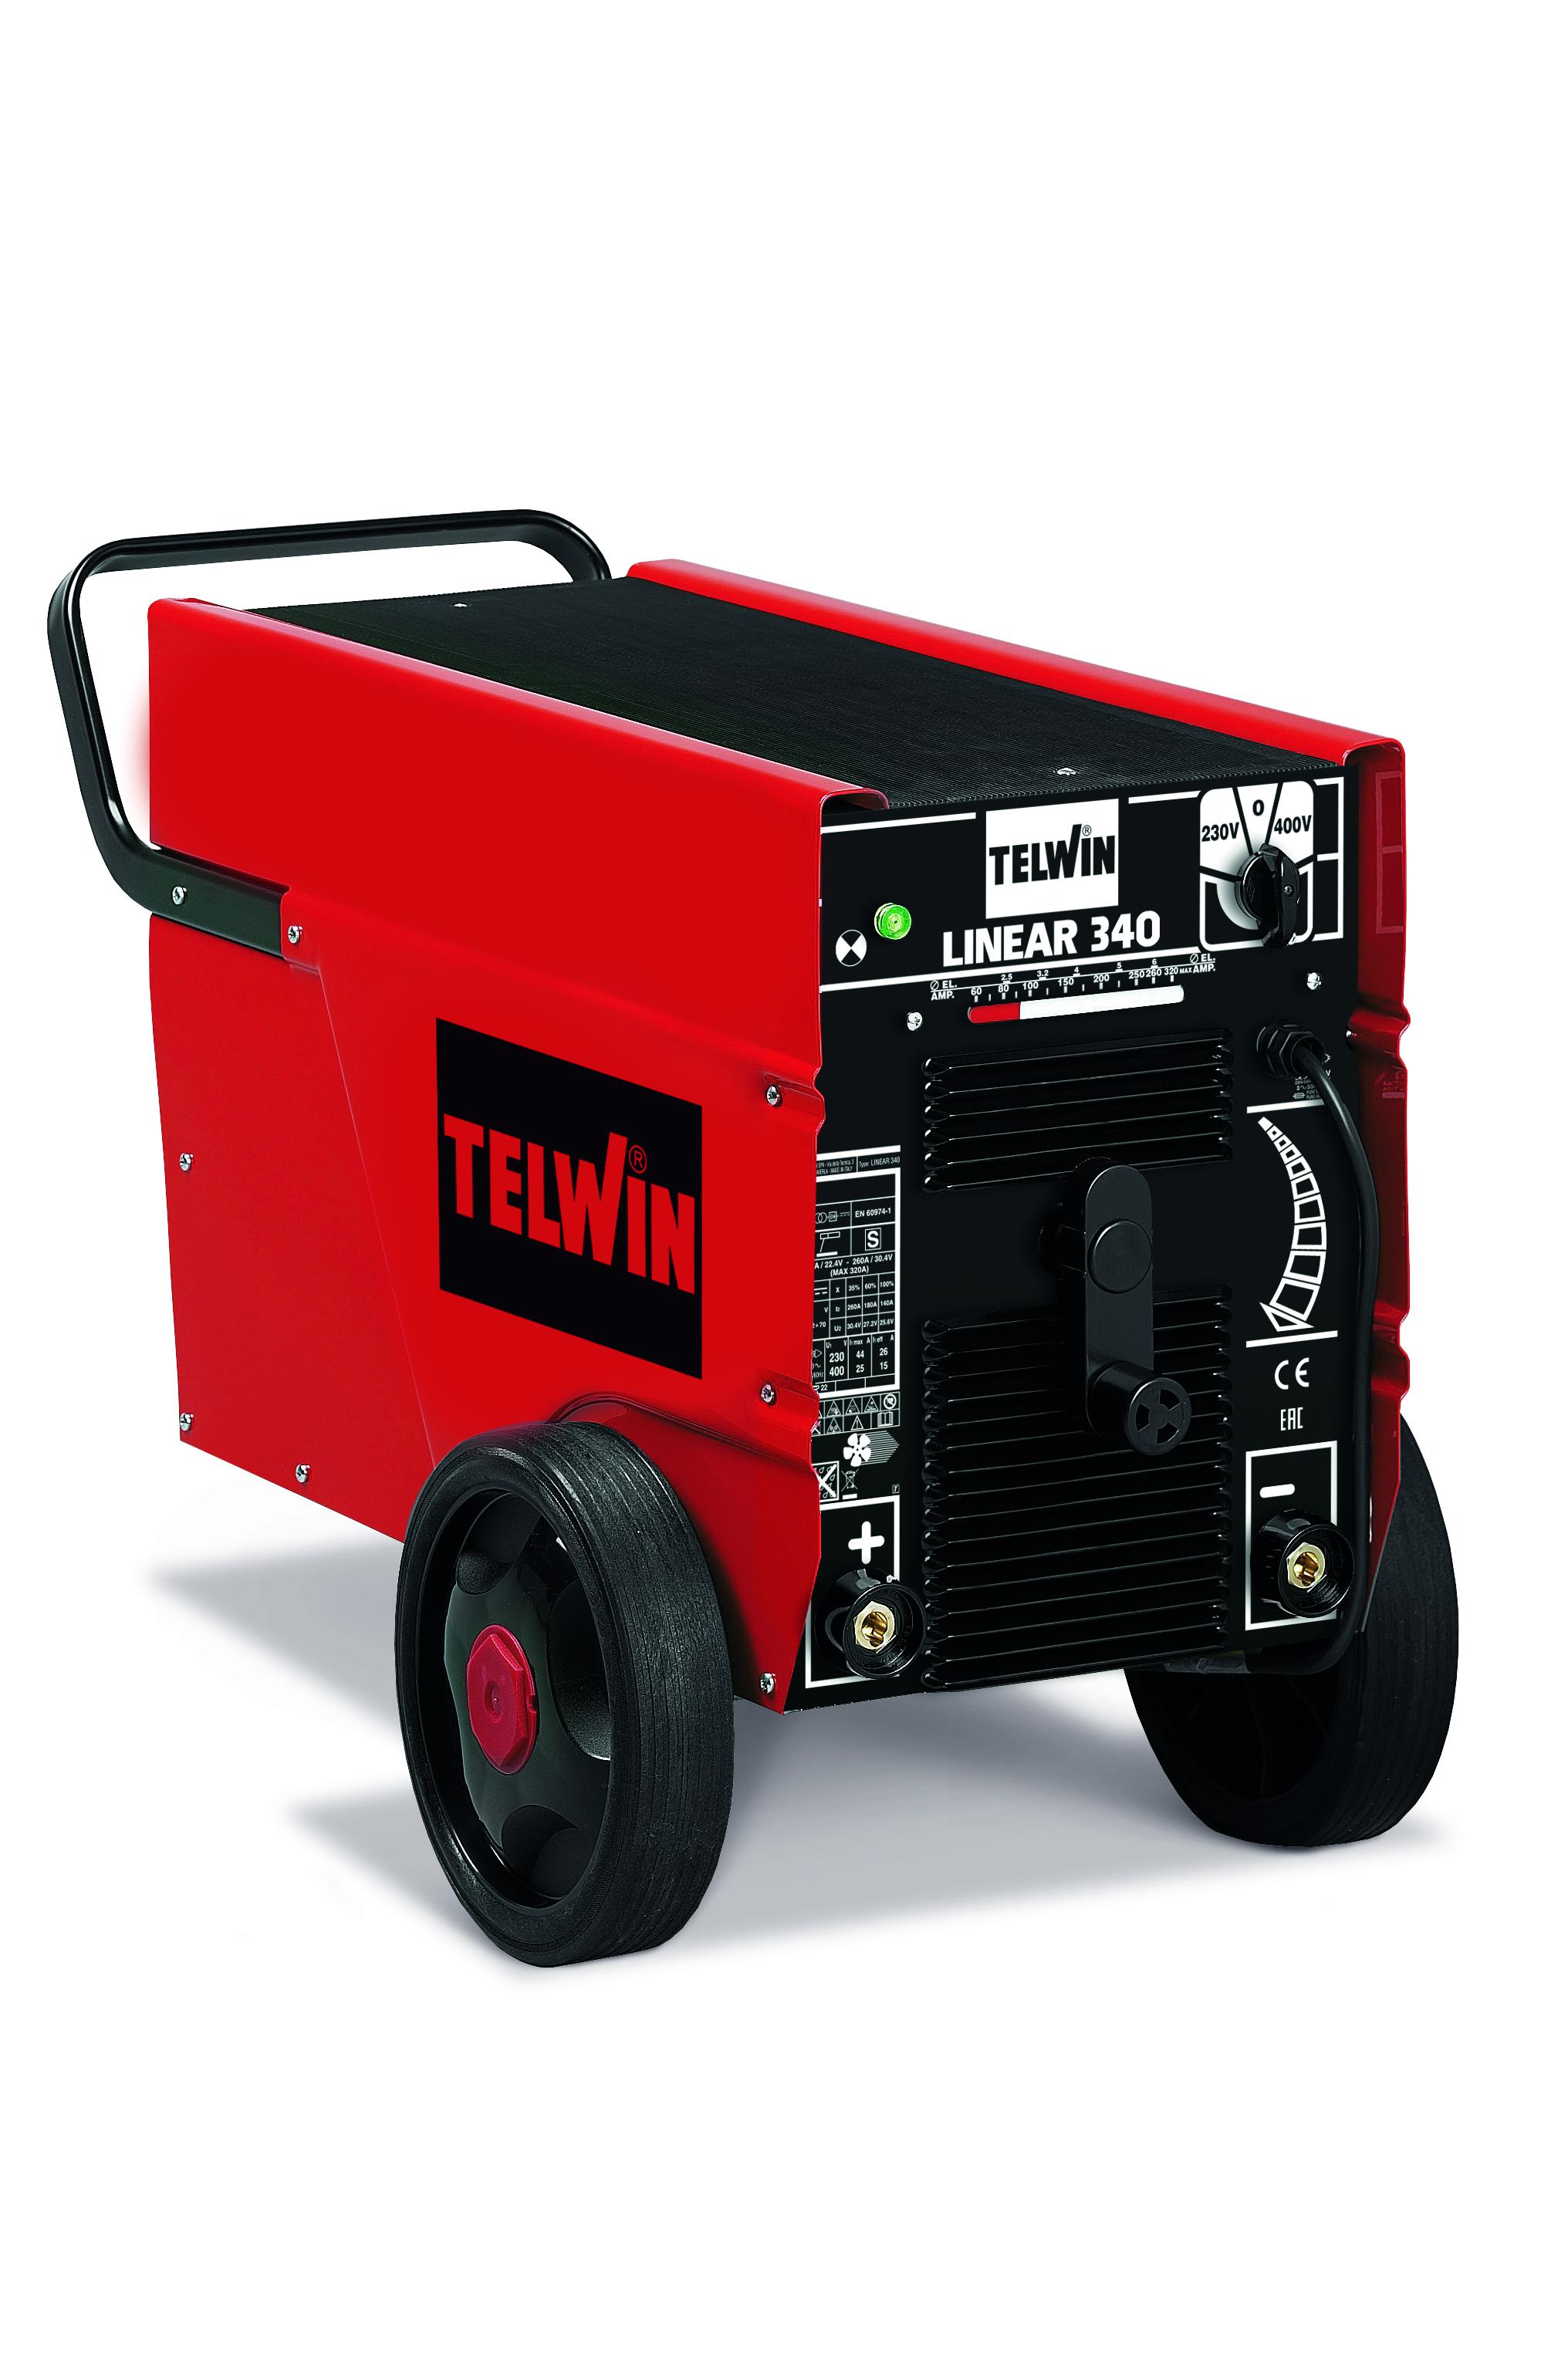 TELWIN 819020 - LINEAR 340  230-400V, MMA Welding Machine, P-Max(7kW)